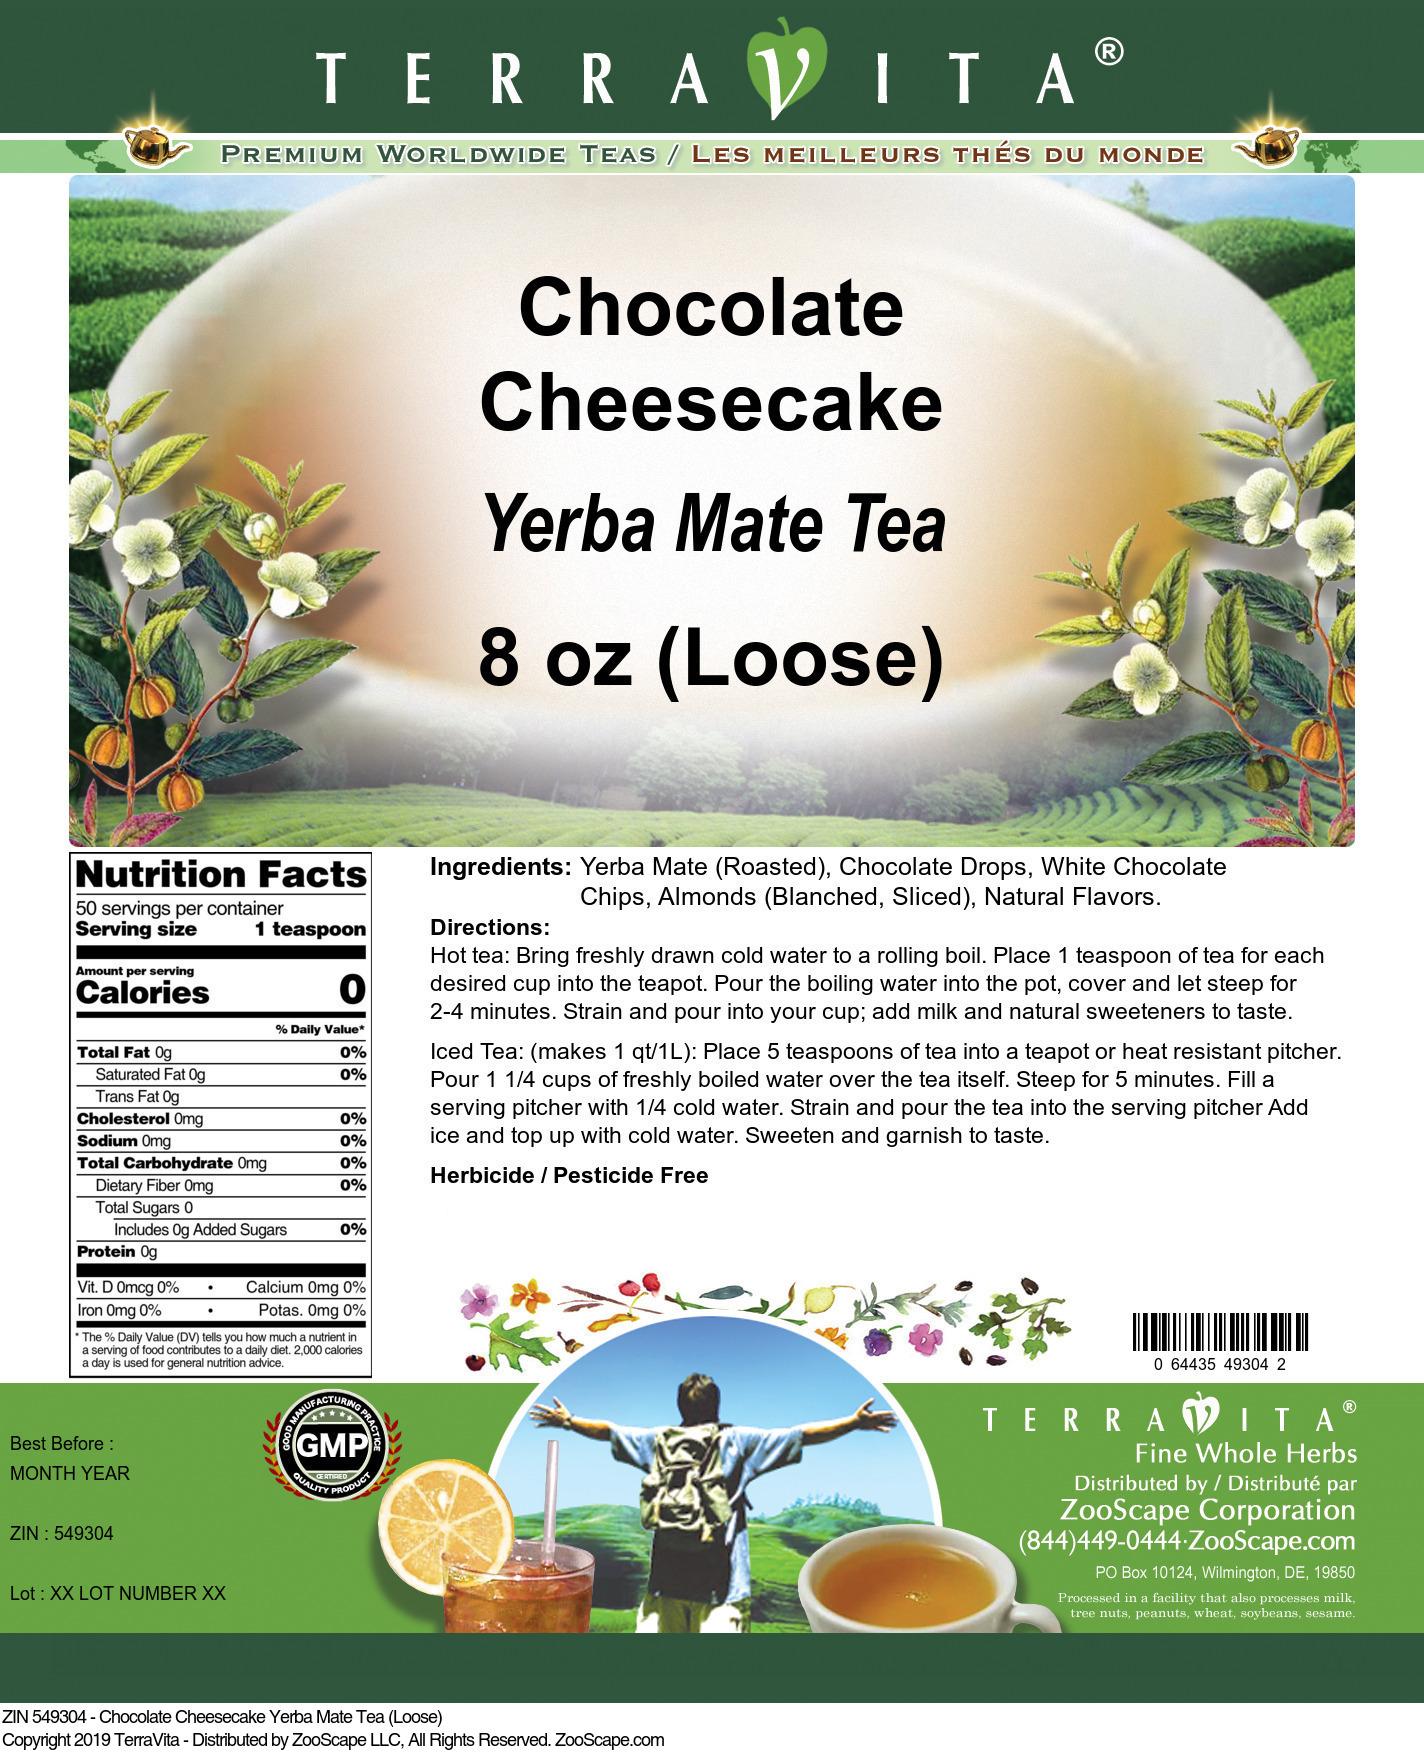 Chocolate Cheesecake Yerba Mate Tea (Loose)